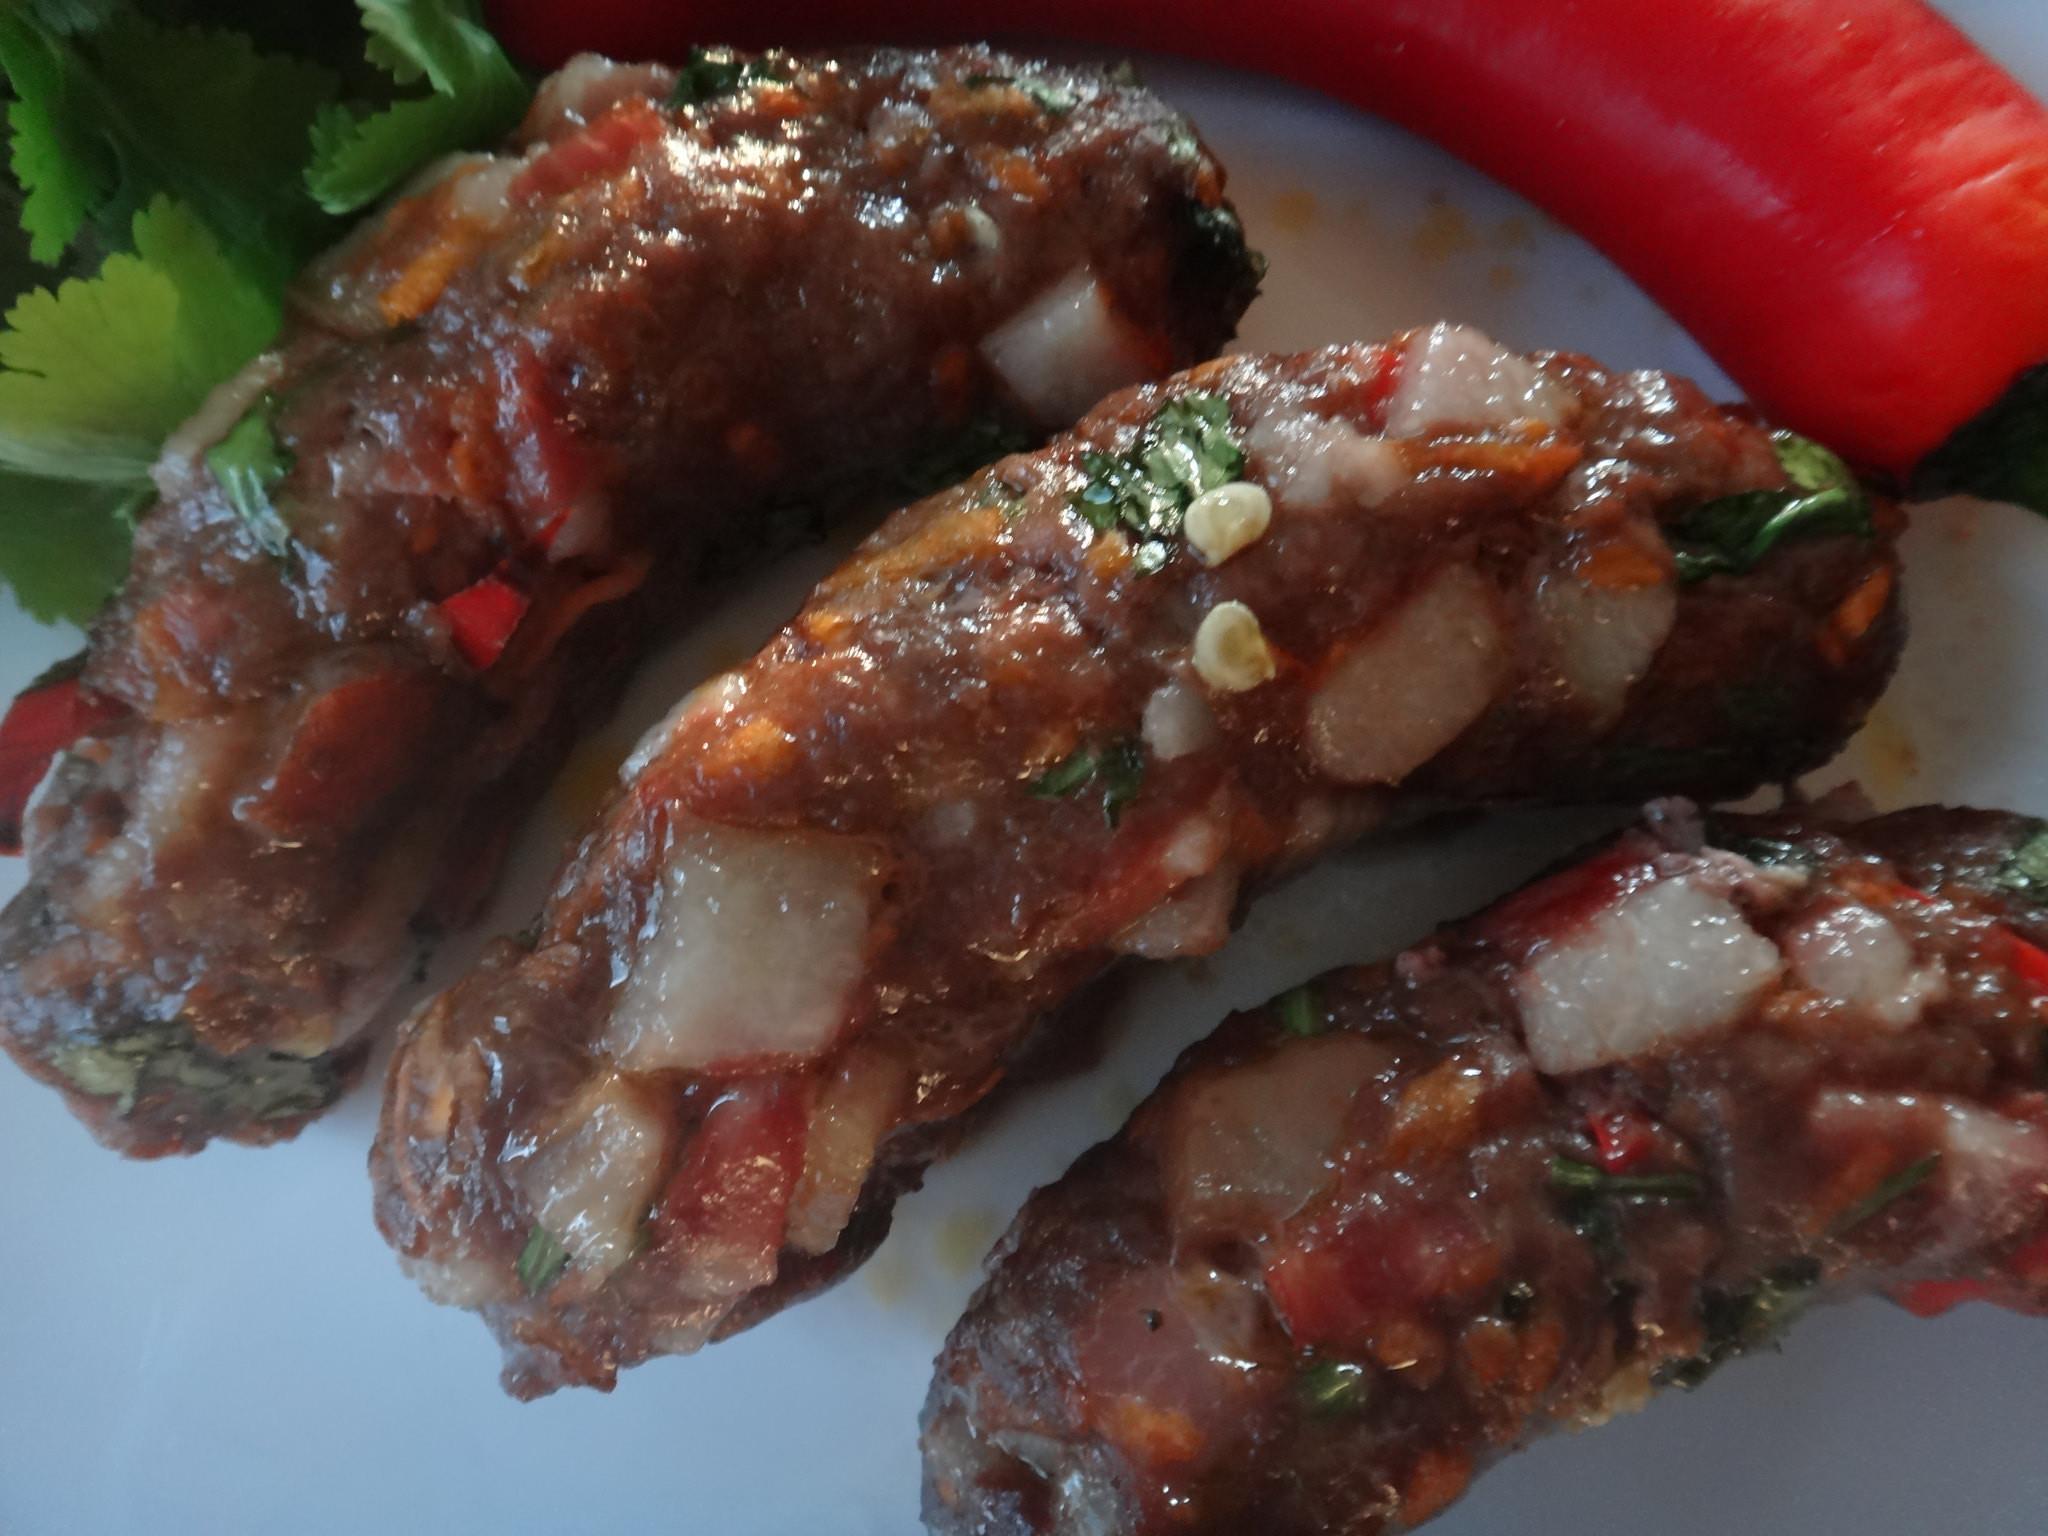 Beef Sausage Recipes  CHILLI CORIANDER SWEET POTATO BIOHACKERS BEEF SAUSAGE